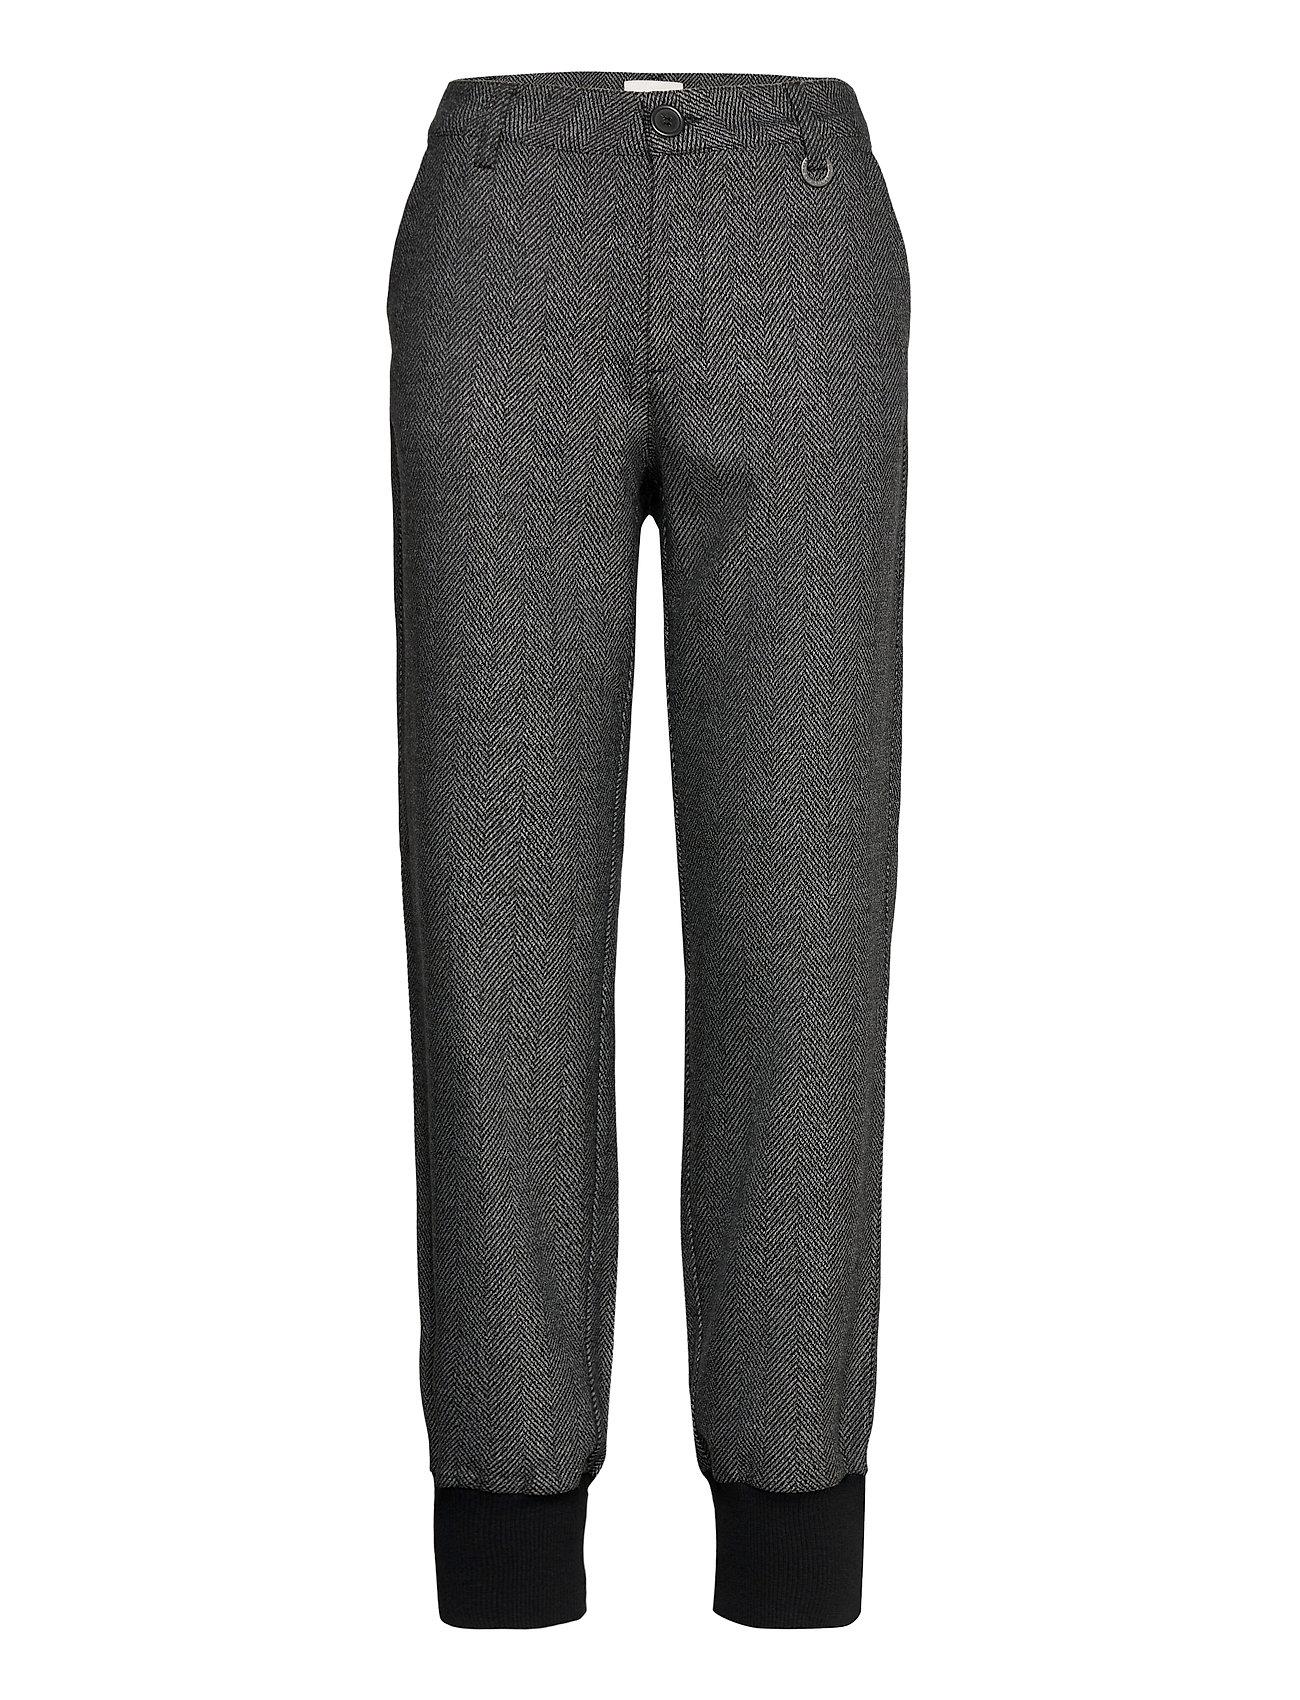 Image of Pzmelissa Pant Casual Bukser Grå Pulz Jeans (3456629373)